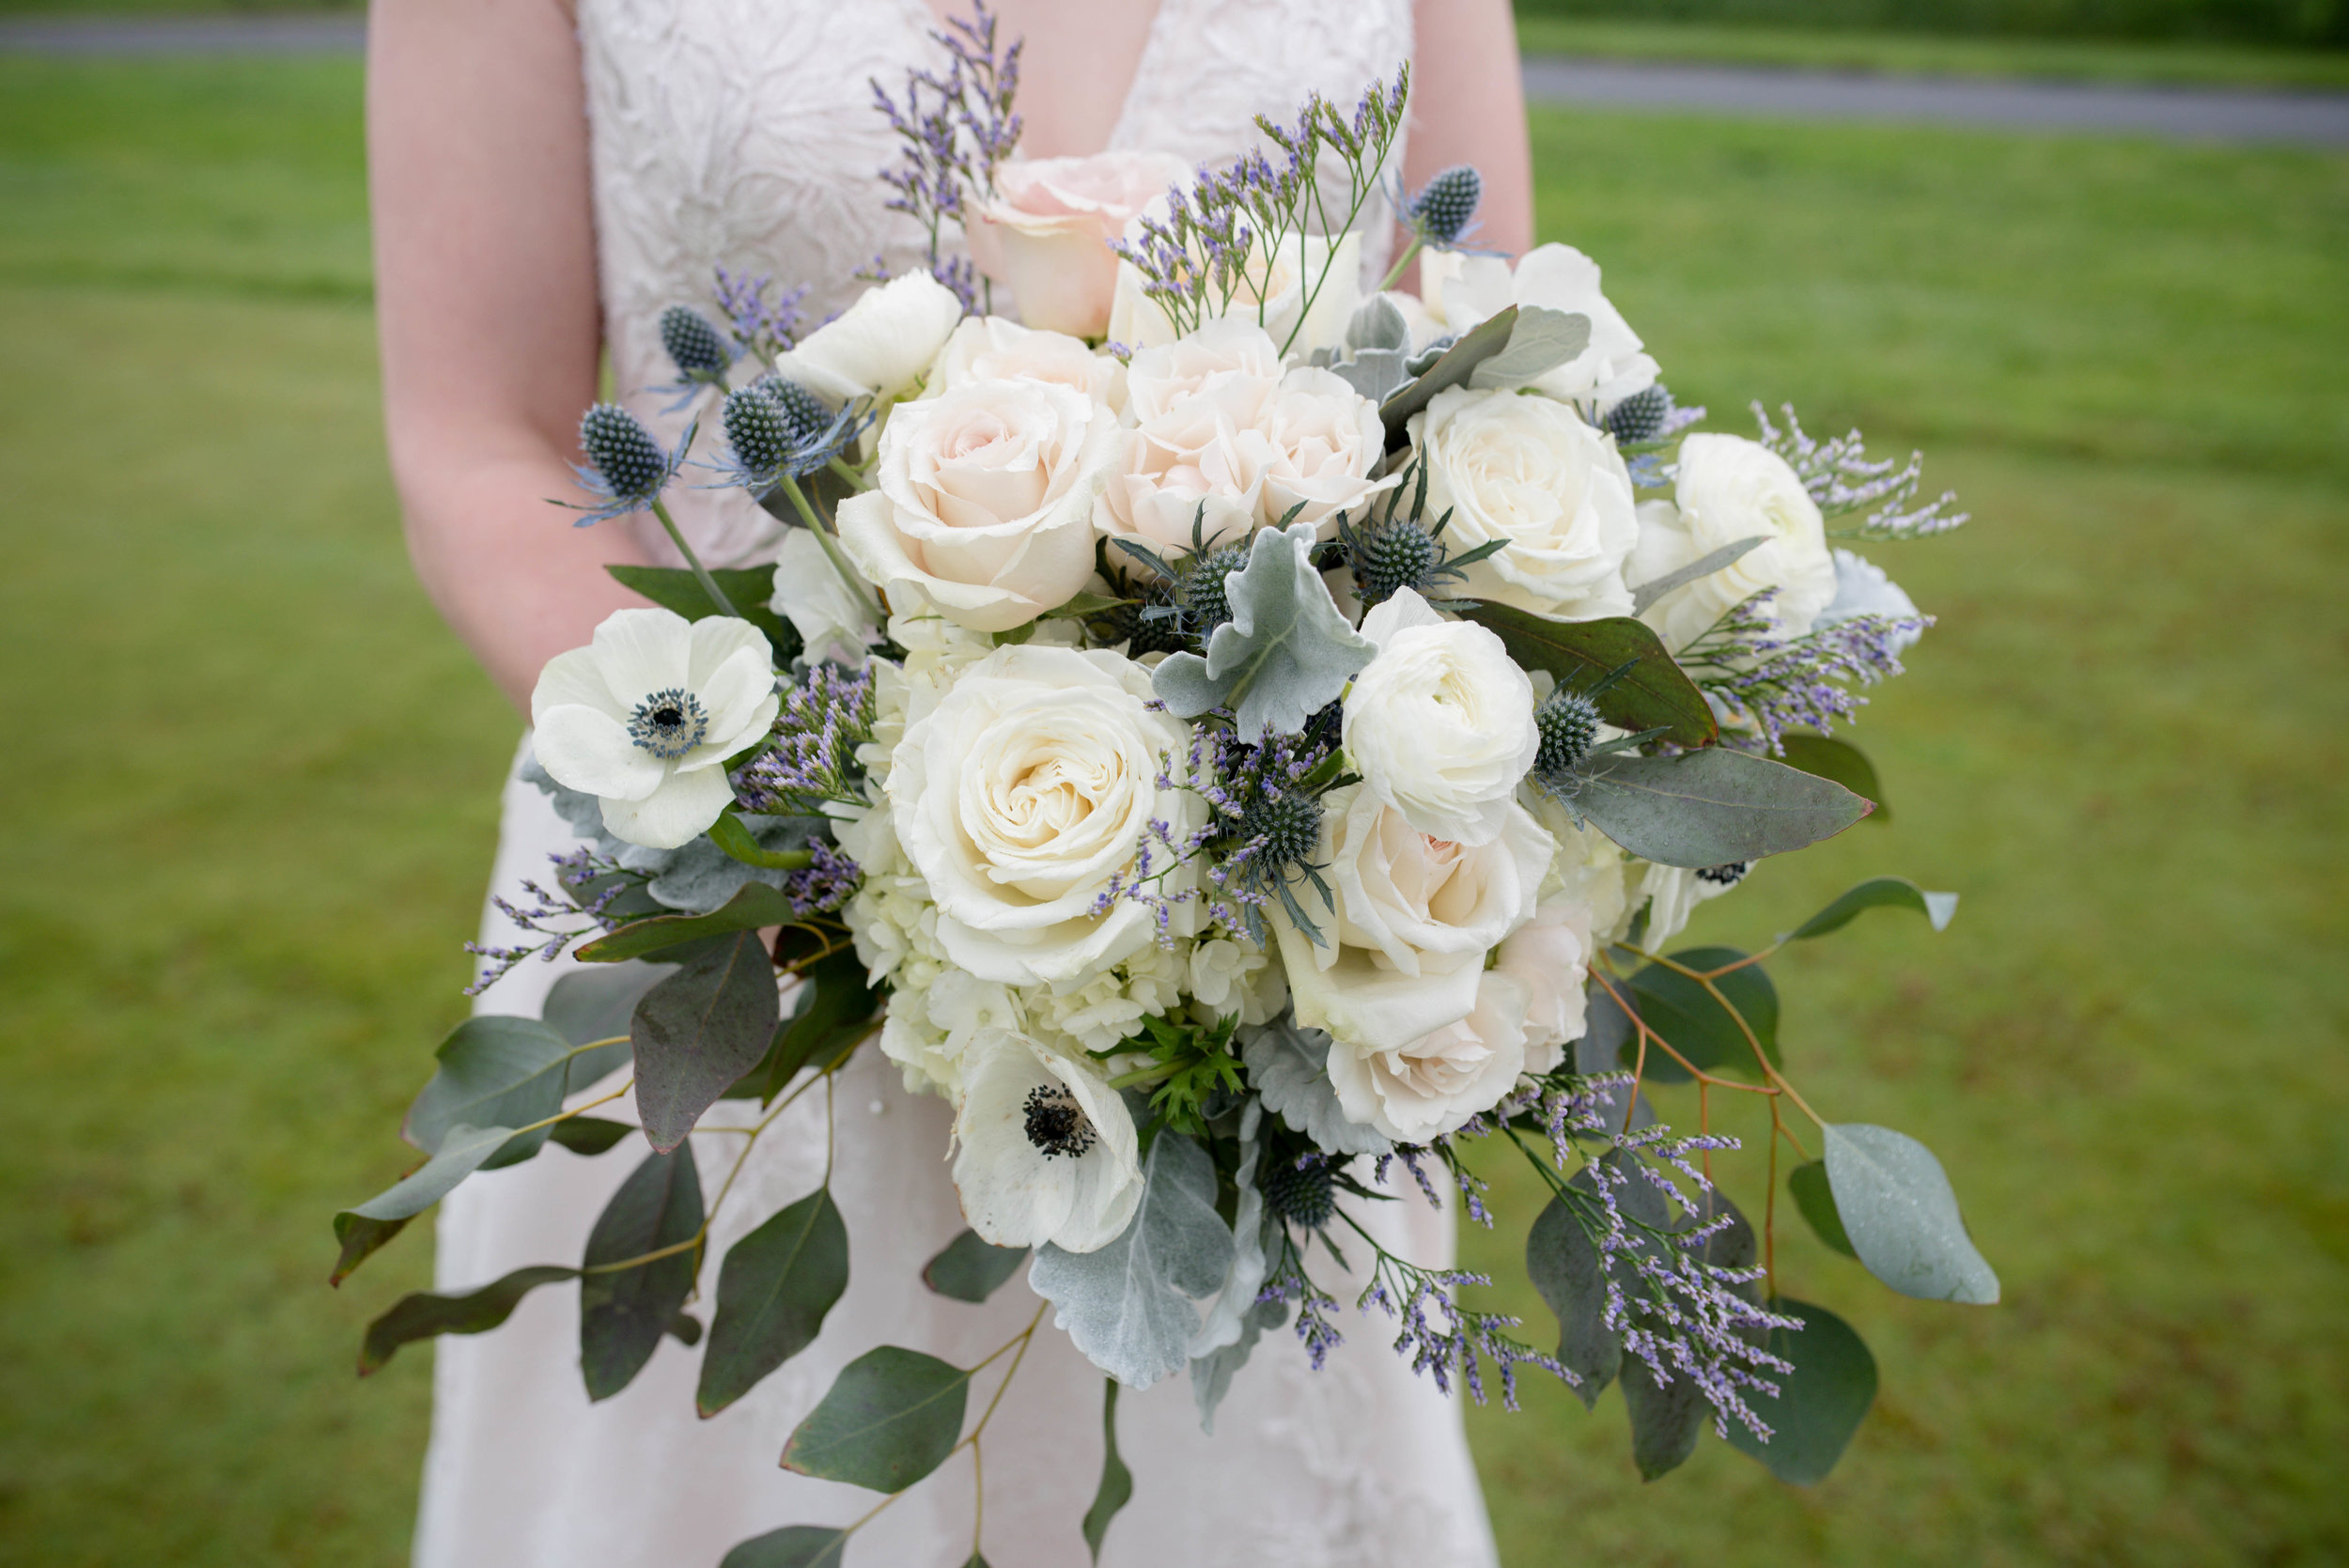 blue-ridge-wedding-ashley-nicole-photography-restoration-hall-crozetphotography-restorationhall-charlottesville-wedding_bride.jpg